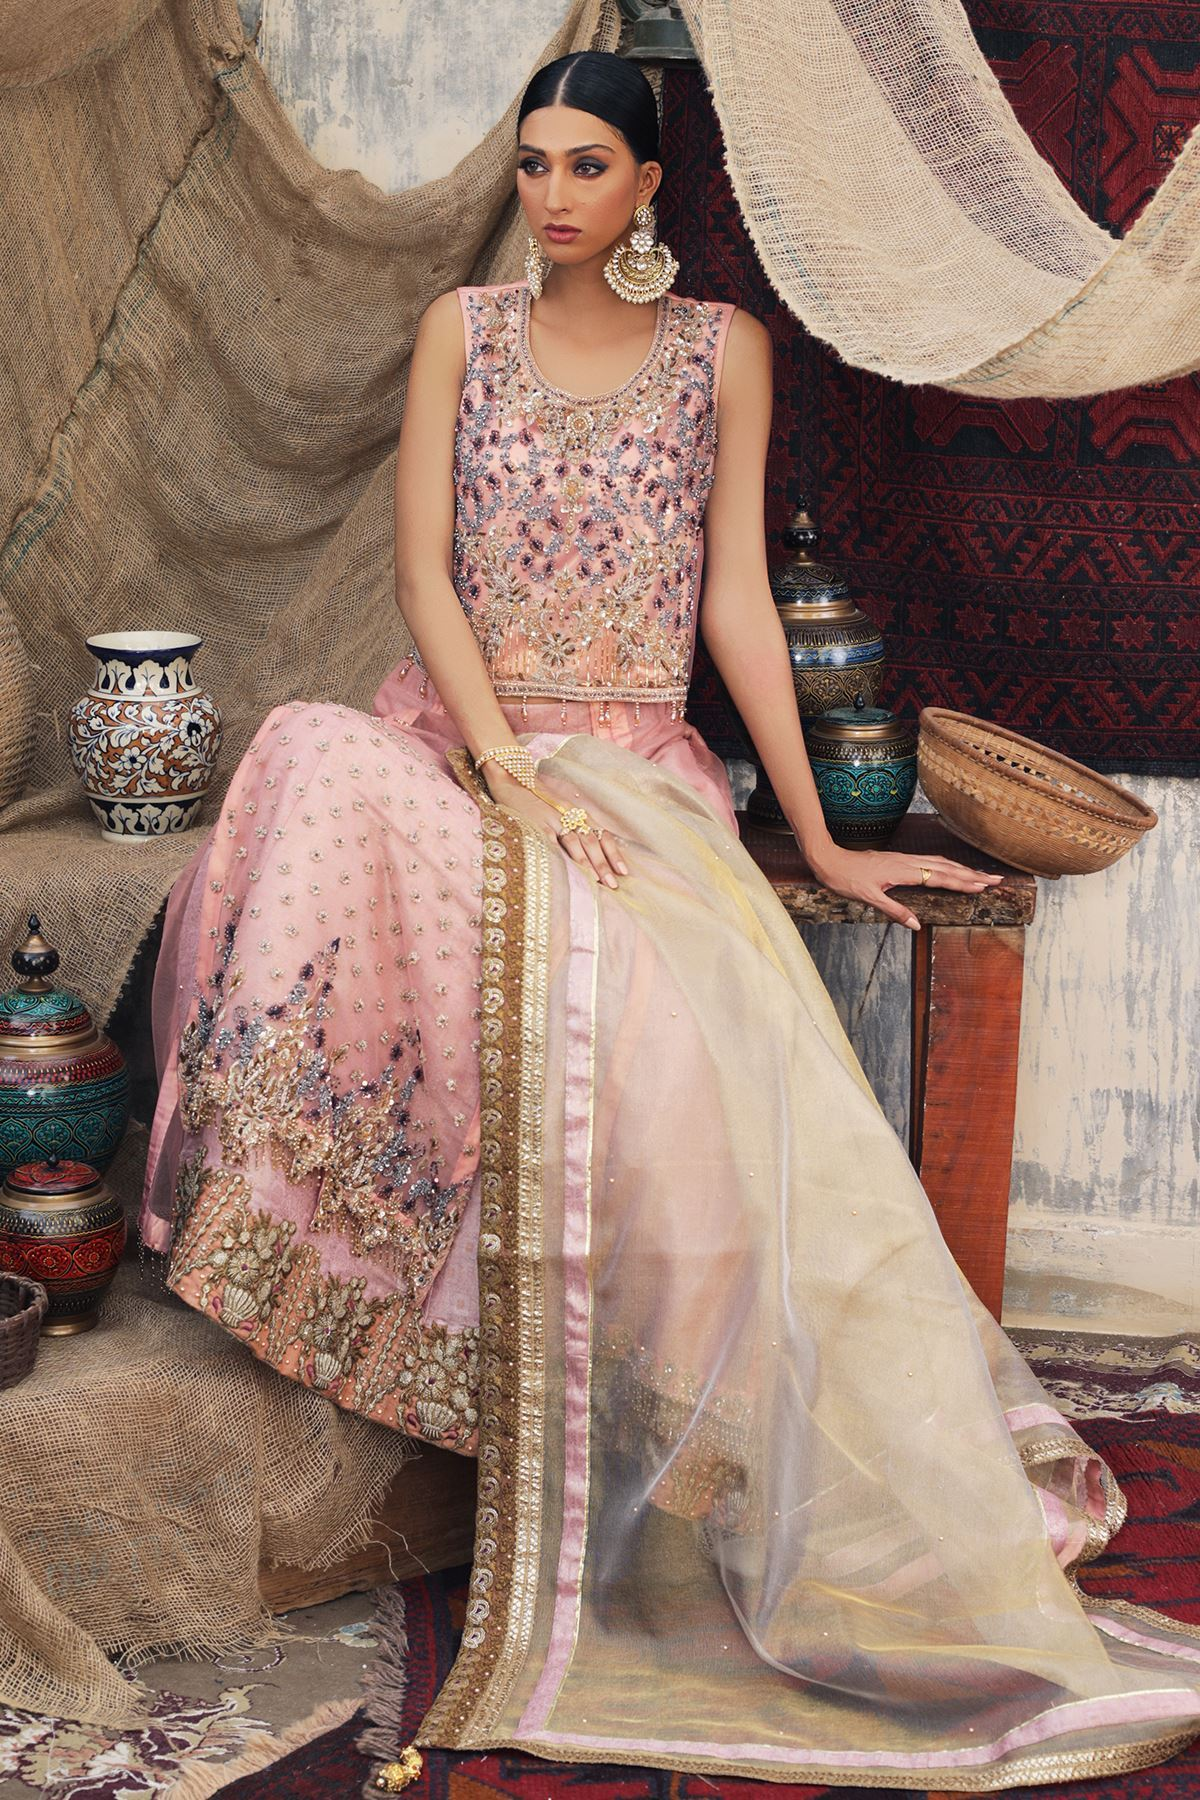 Moazzam Khan Party Wear 3PC Choli Sharara Dupatta in Pink for Women